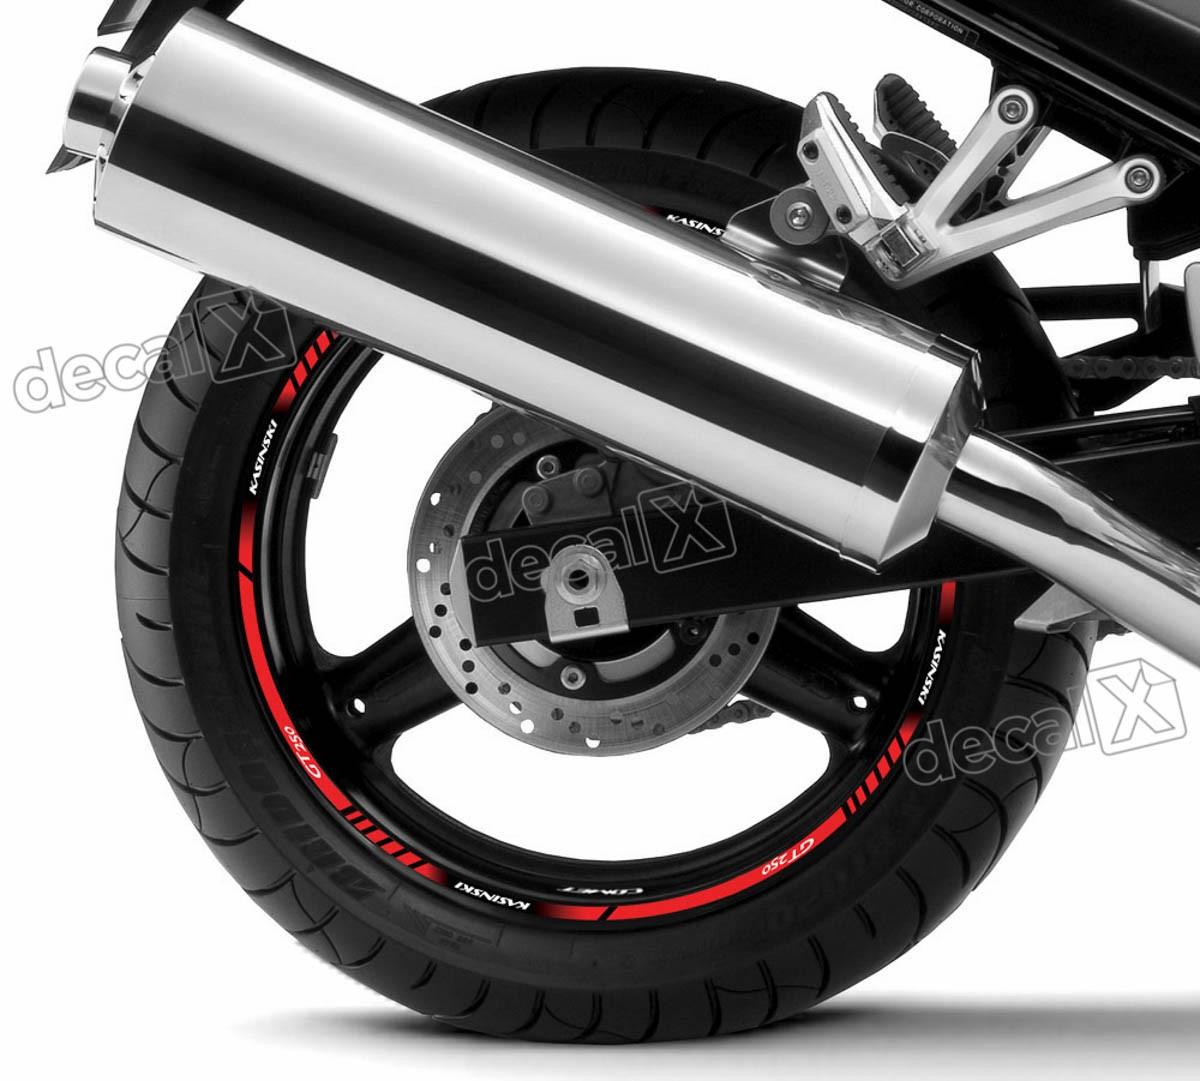 Armario De Parede Pequeno ~ Adesivo Friso Refletivo Roda Moto Kasinski Comet Gt 250 Fr01 Adesivos para motos& Adesivos